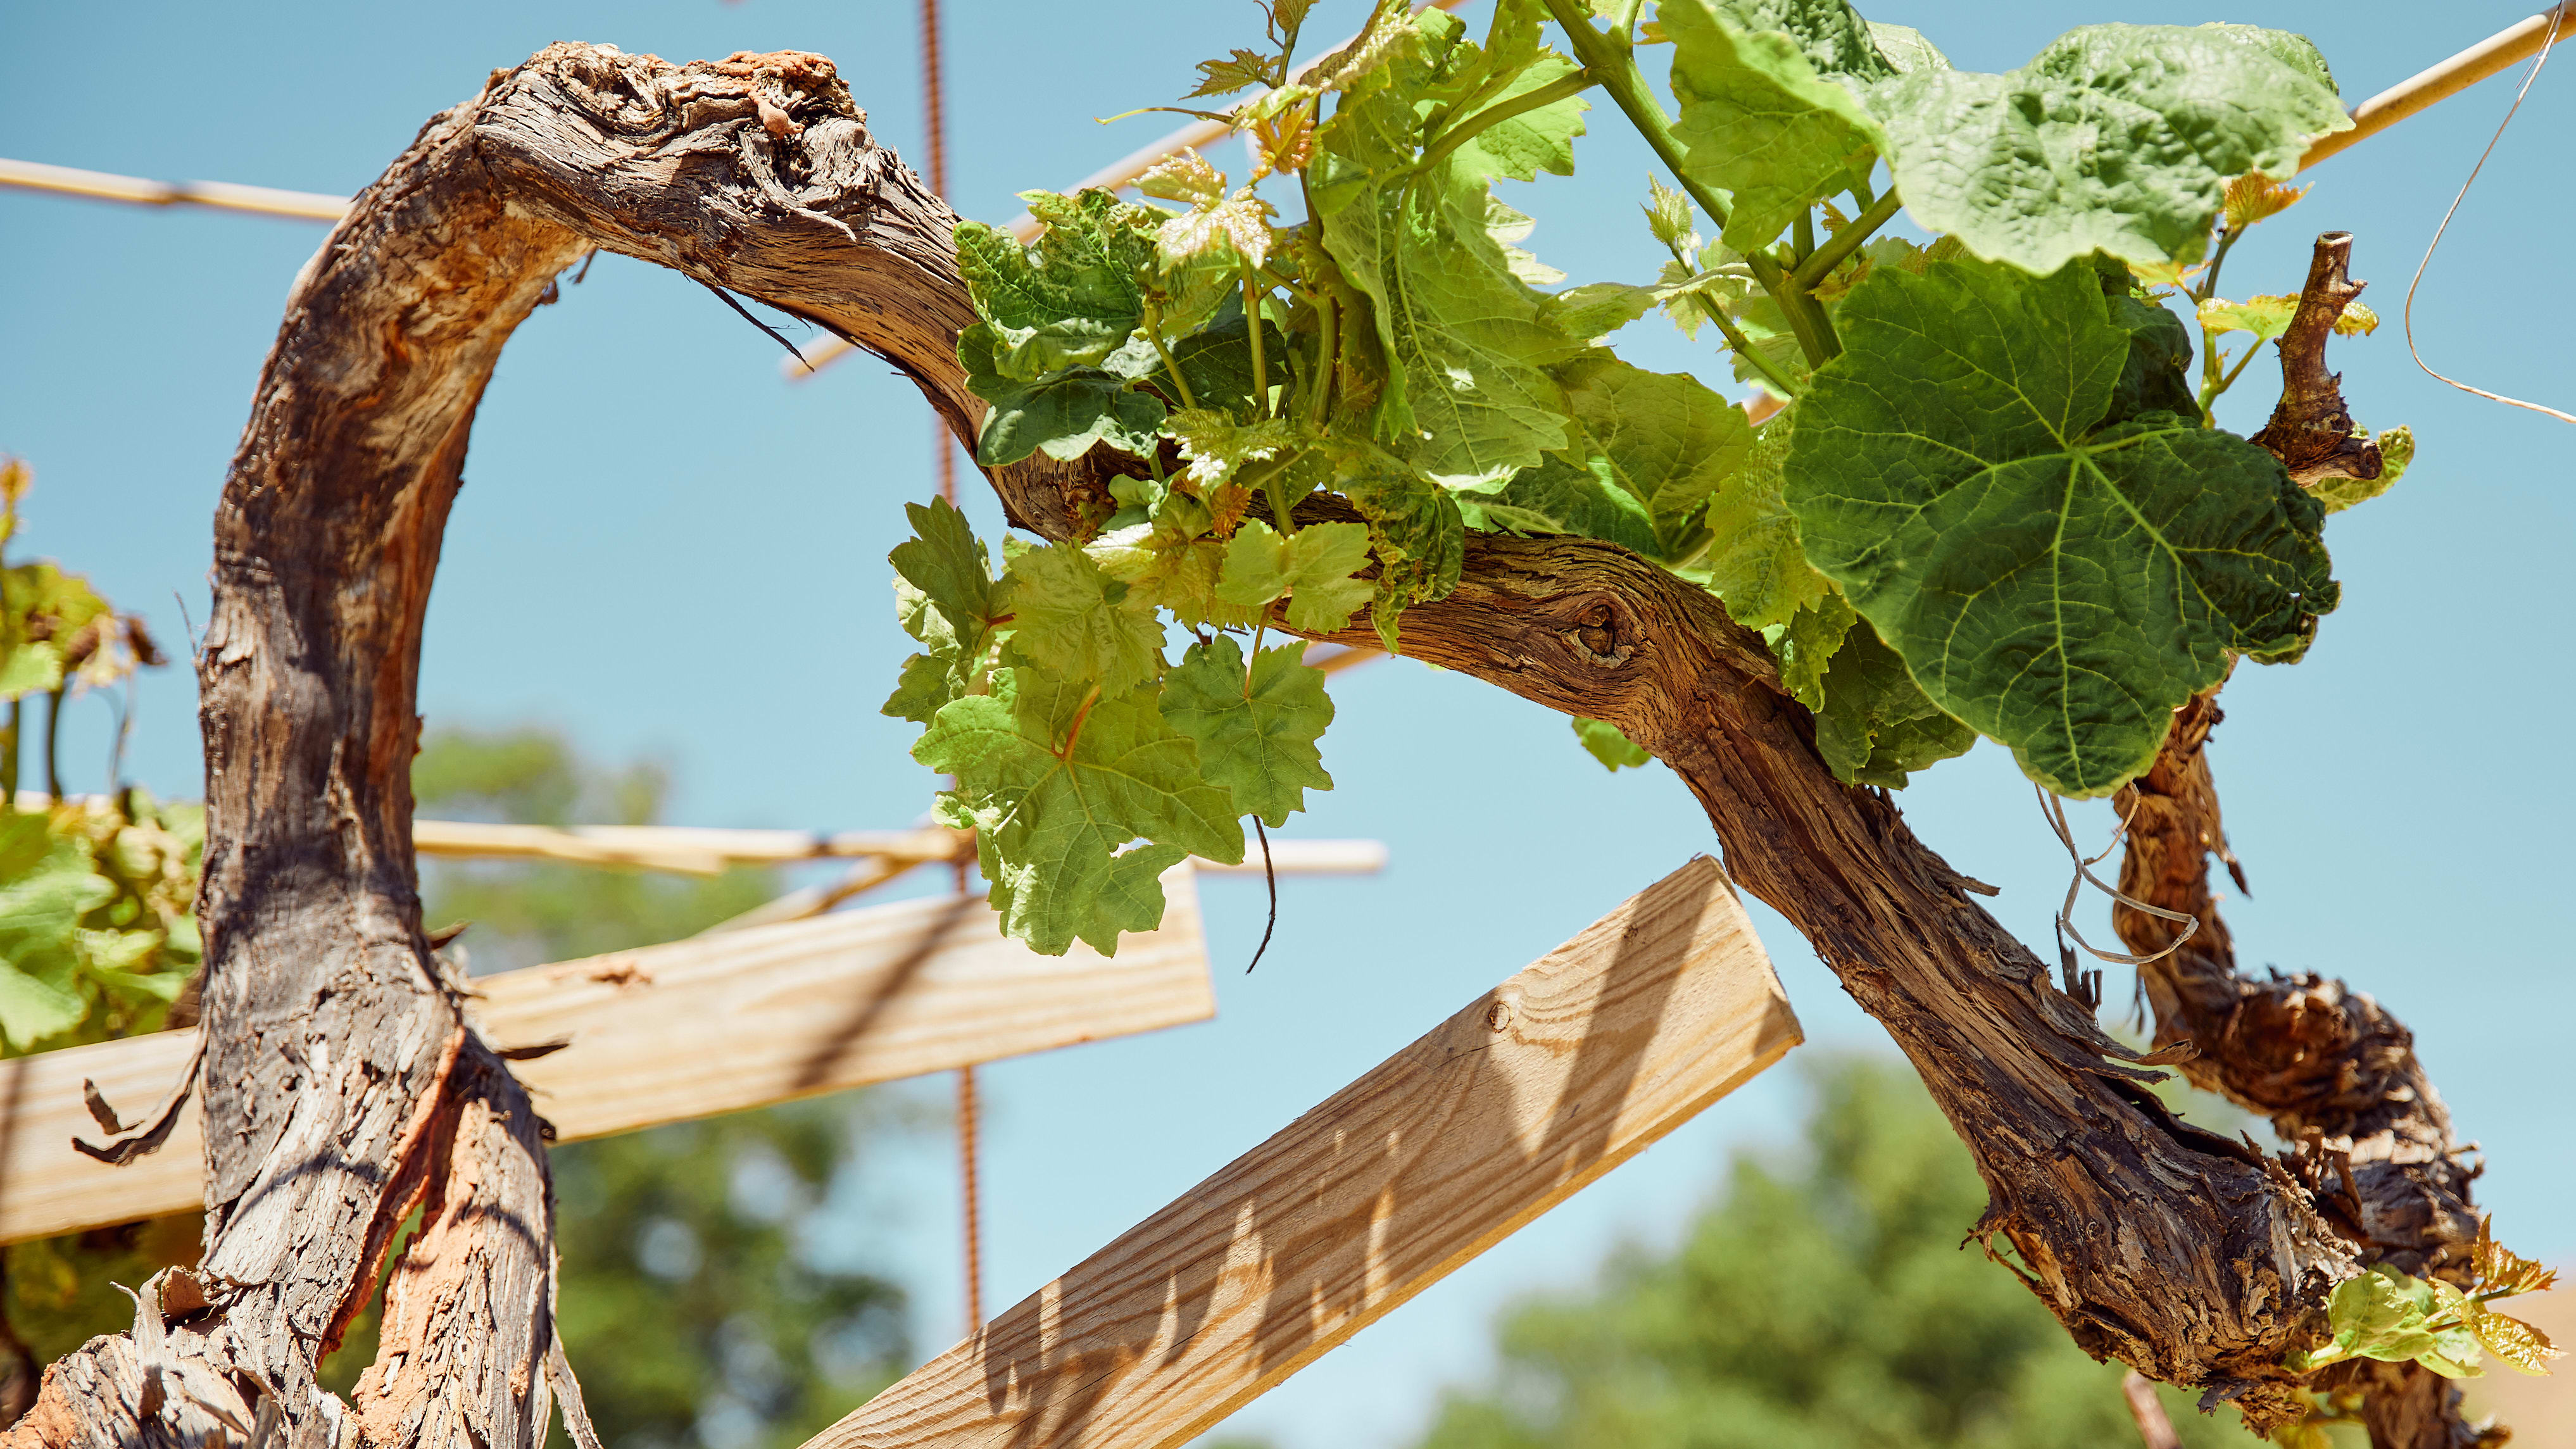 Do Old Vines Produce Better Wine?